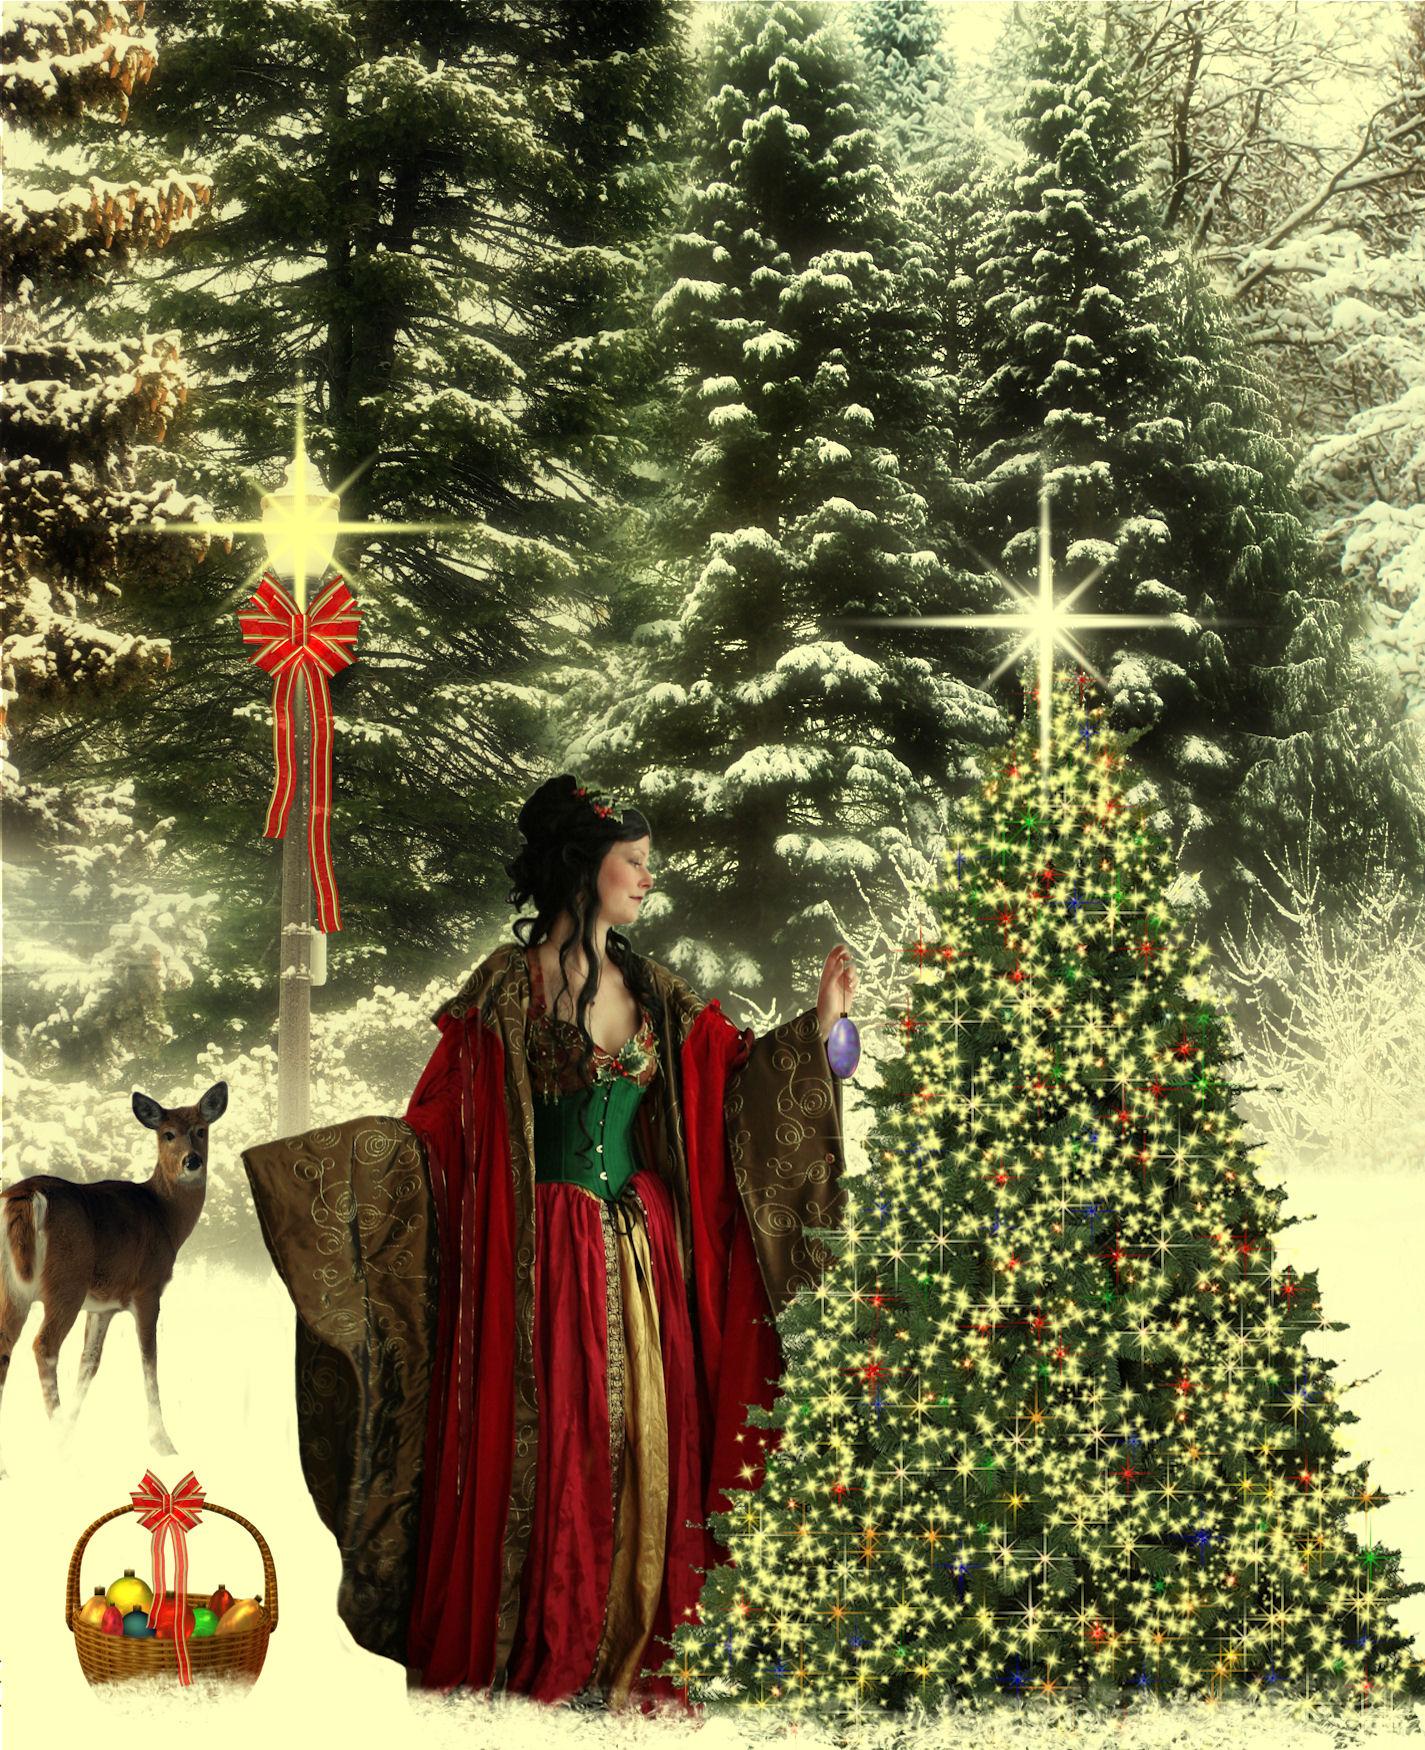 Fantasy Christmas by Obsidian-Siren on DeviantArt